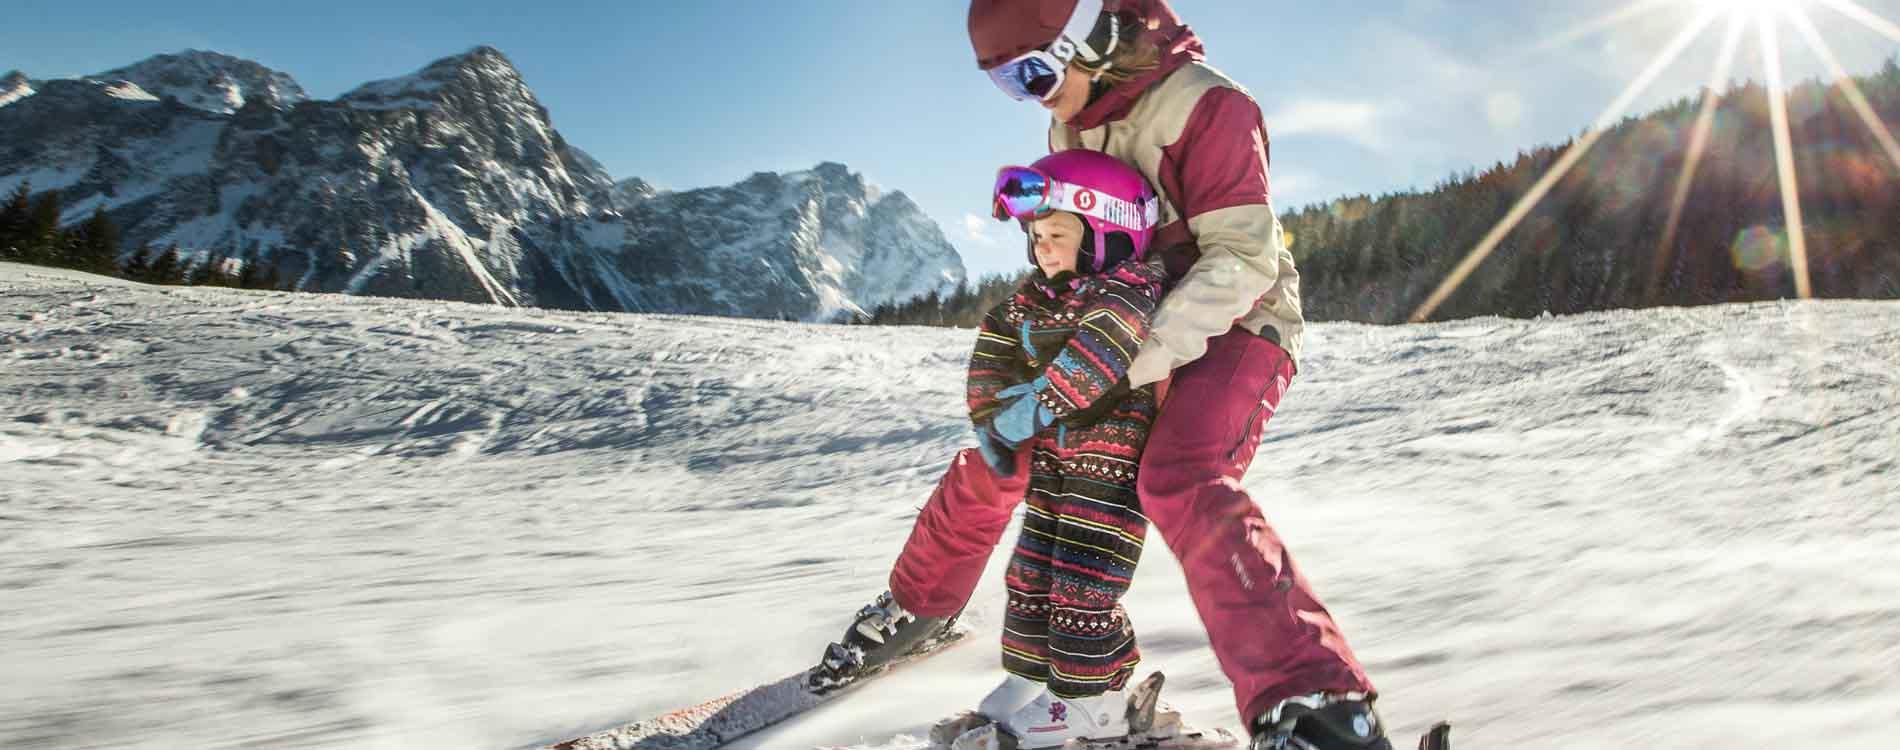 niche destinations 4-star Tirolerhof Ehrwald Tyrol Austria Tyorlean Zugspitz Arena wellness skiing family fun